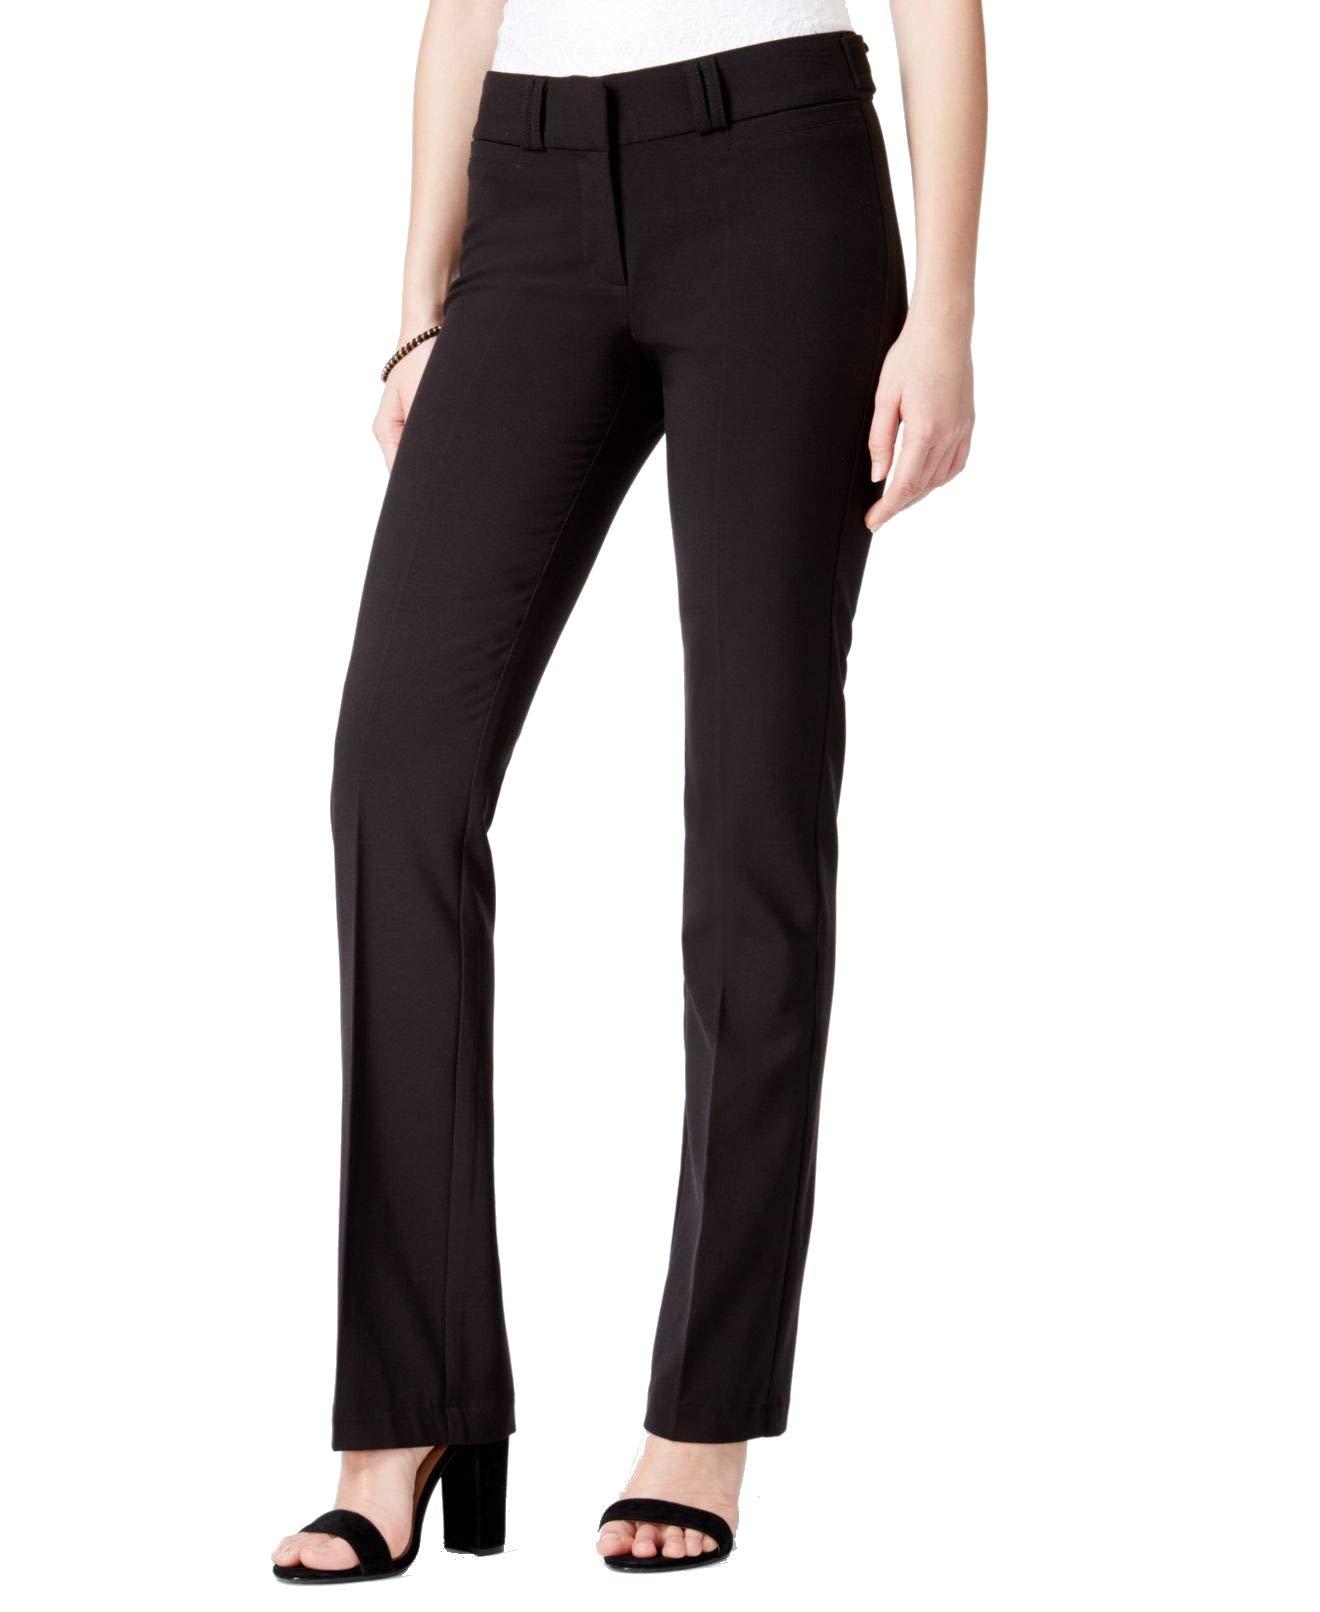 XOXO Solid 5/6 Junior Stretch Straight Leg Dress Pants Black 6